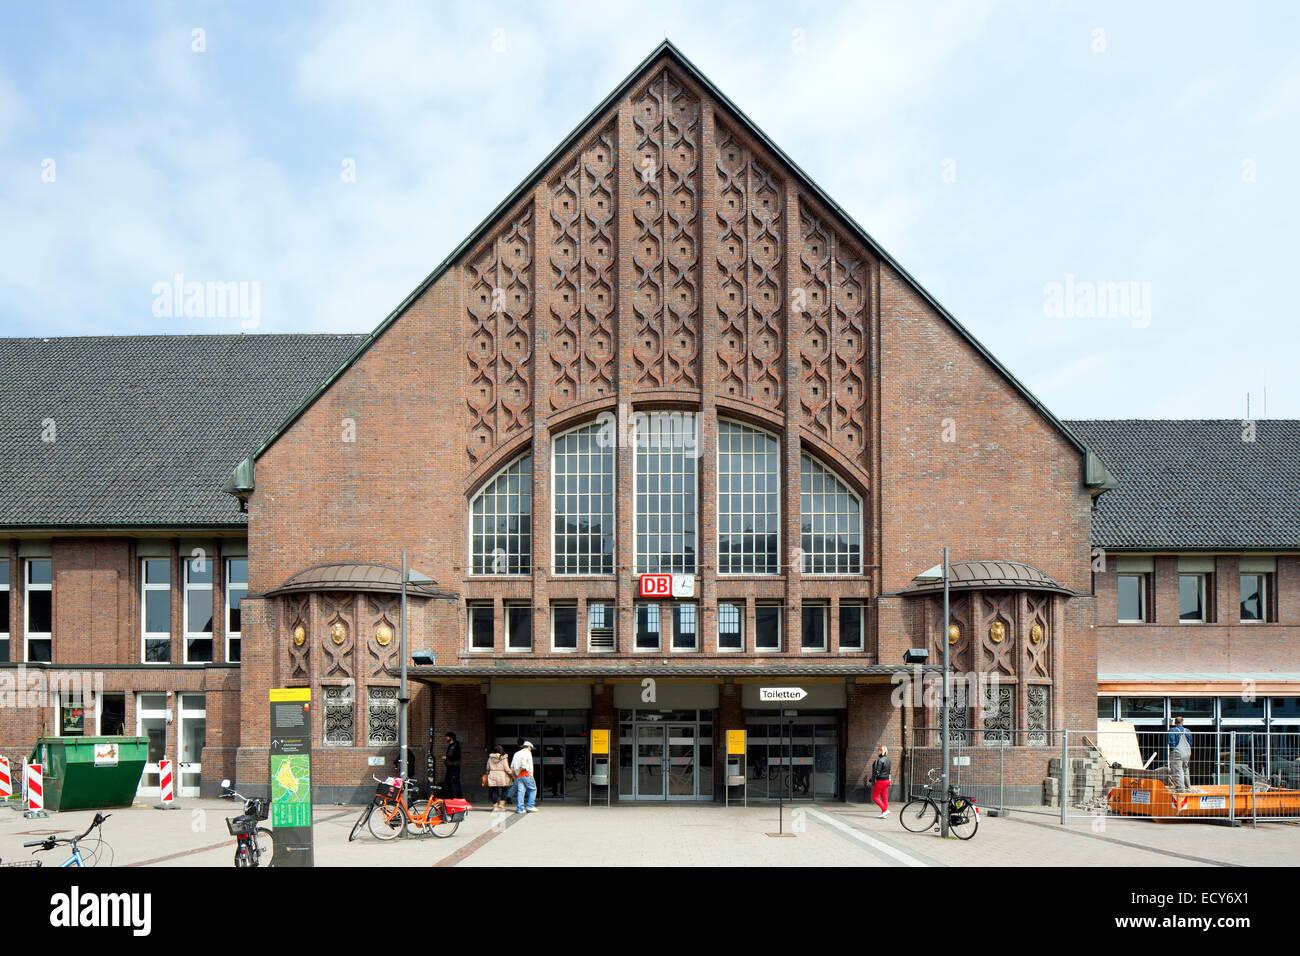 Oldenburg main station, Oldenburg, Lower Saxony, Germany - Stock Image